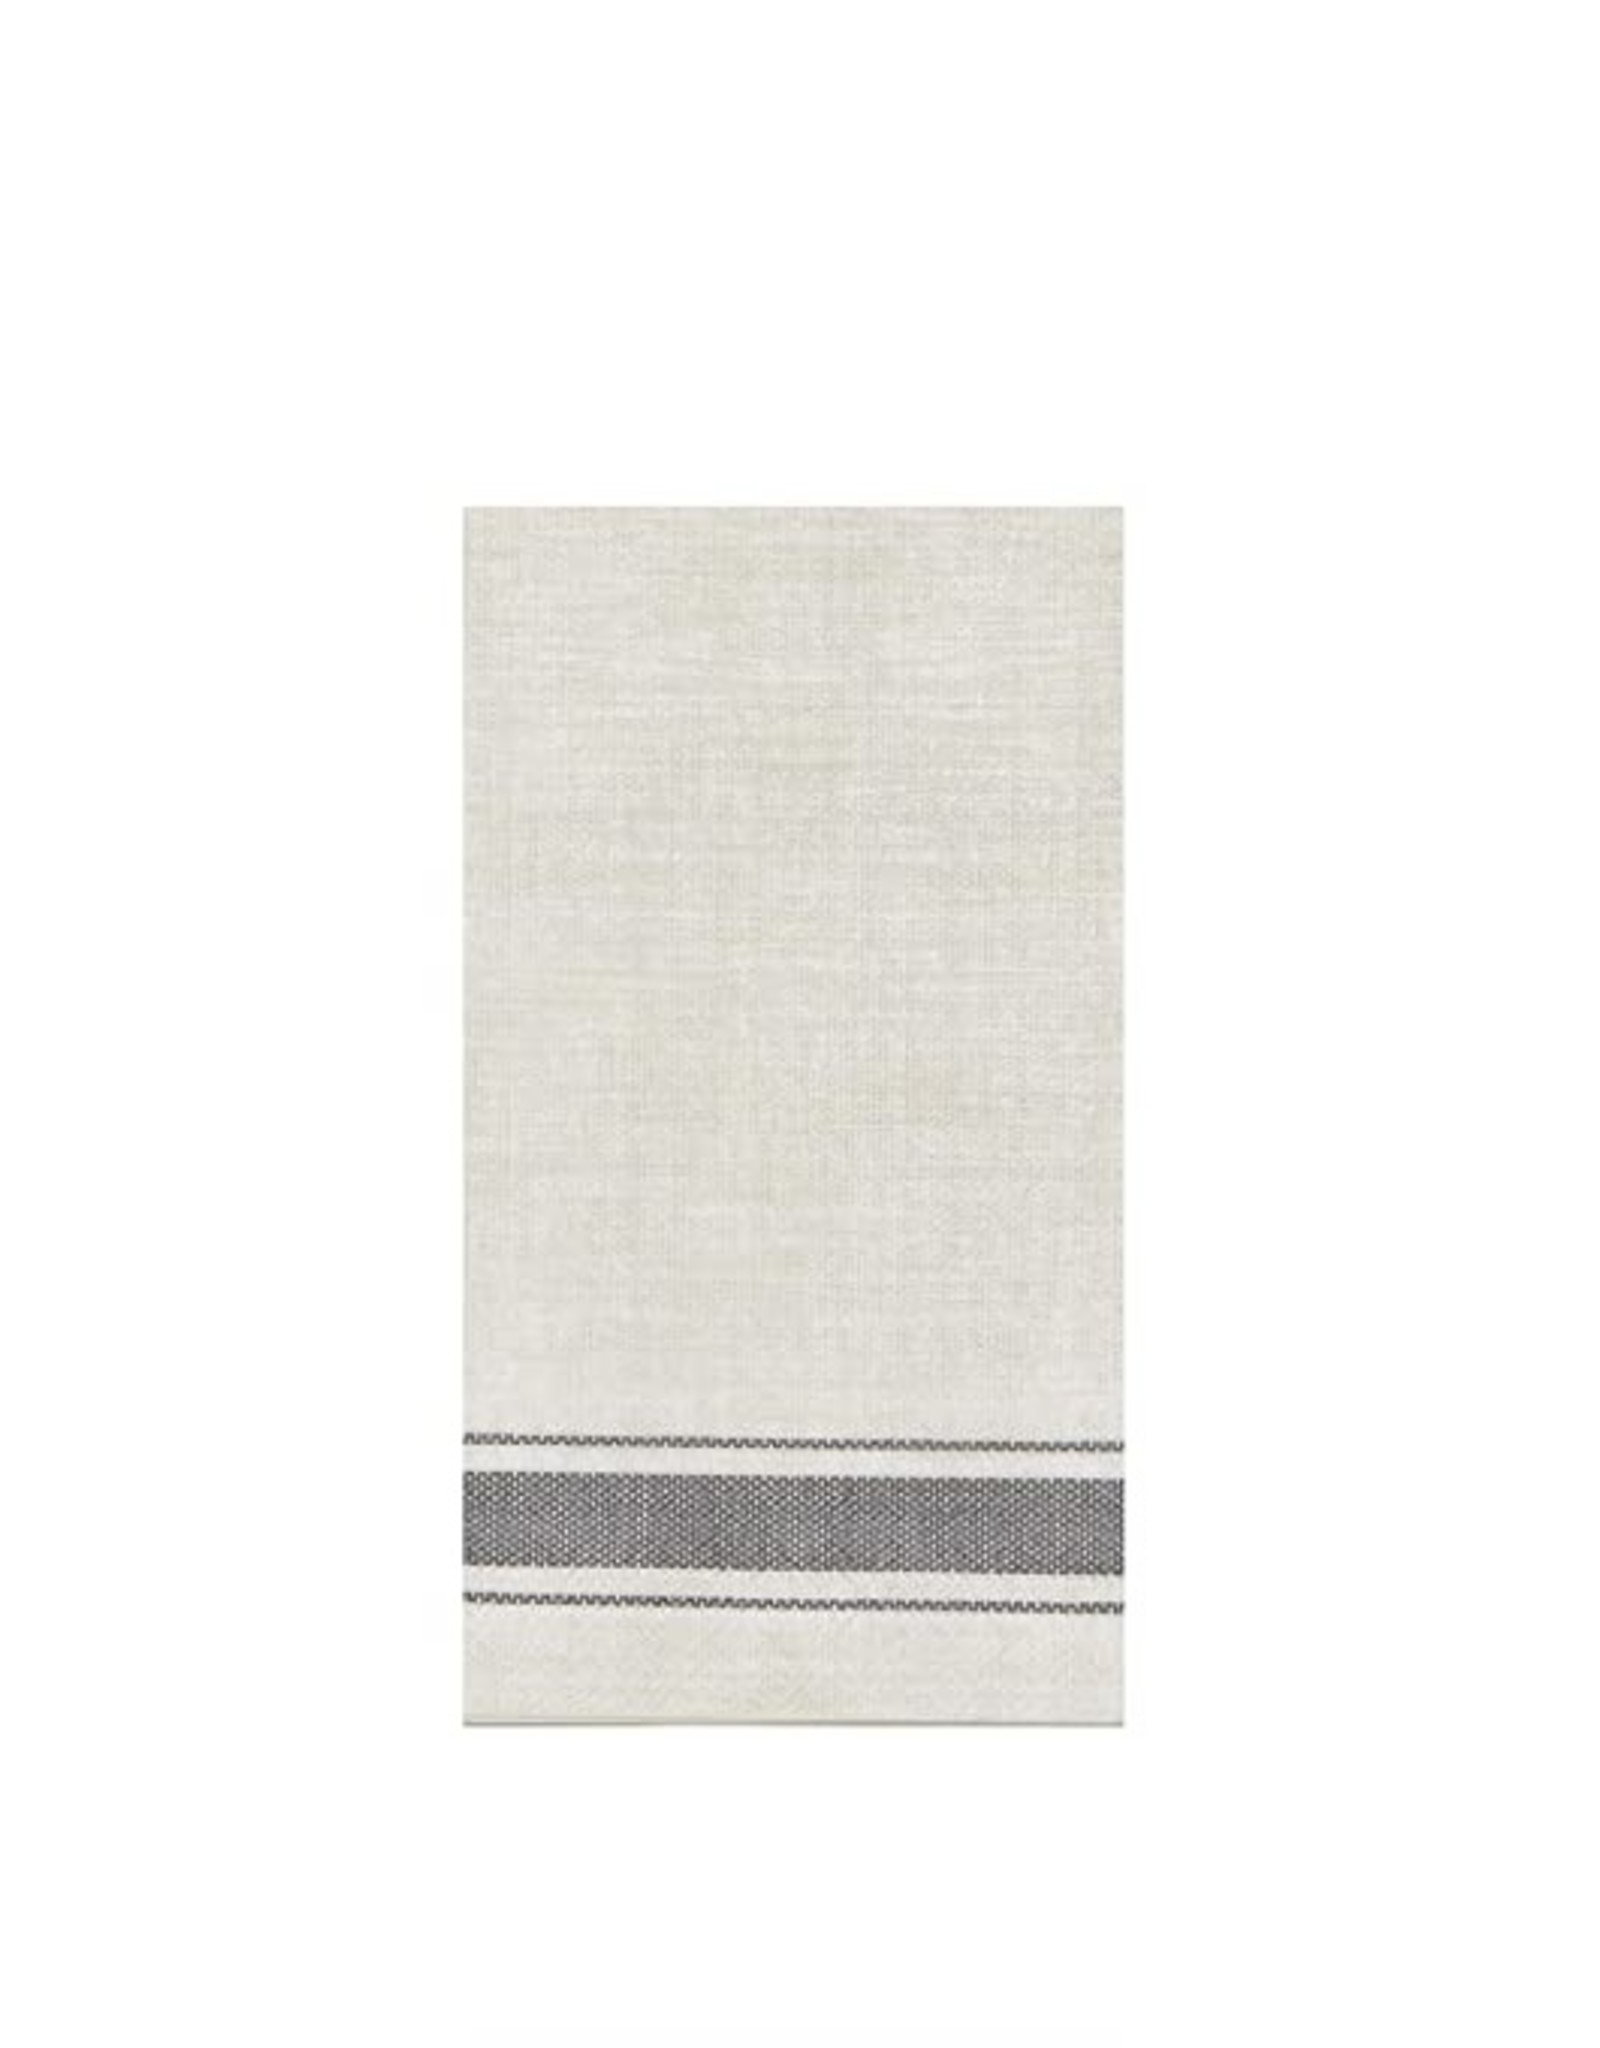 HARMAN Bistro Stripe Paper Guest Napkins Grey